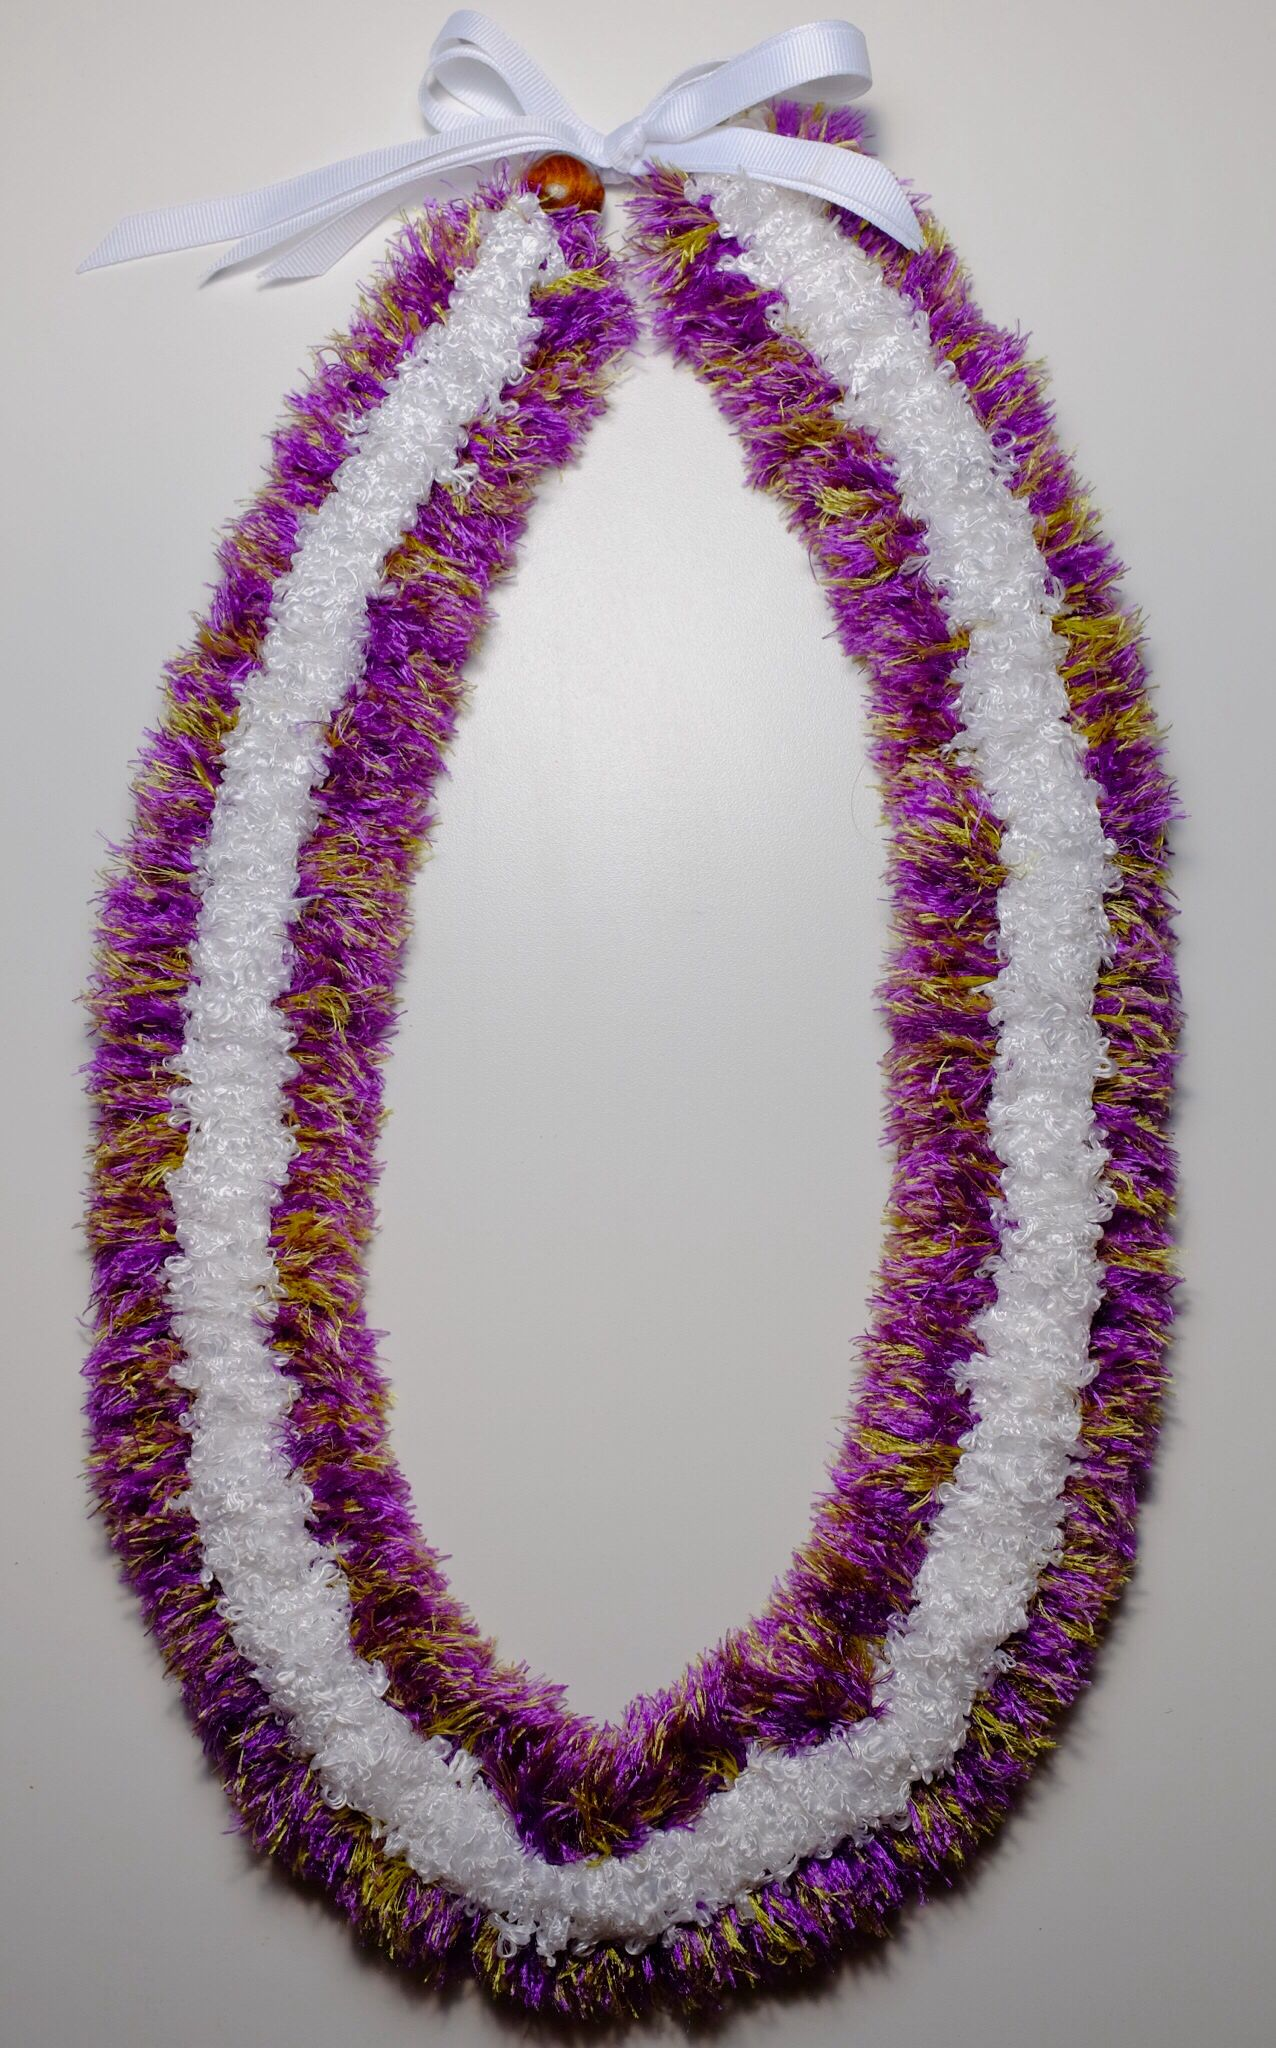 Eyelash Lei : eyelash, Three, Straw, Purple, Colored, Eyelash, White, Kalina, Center., Graduation, Ribbons,, Yarn,